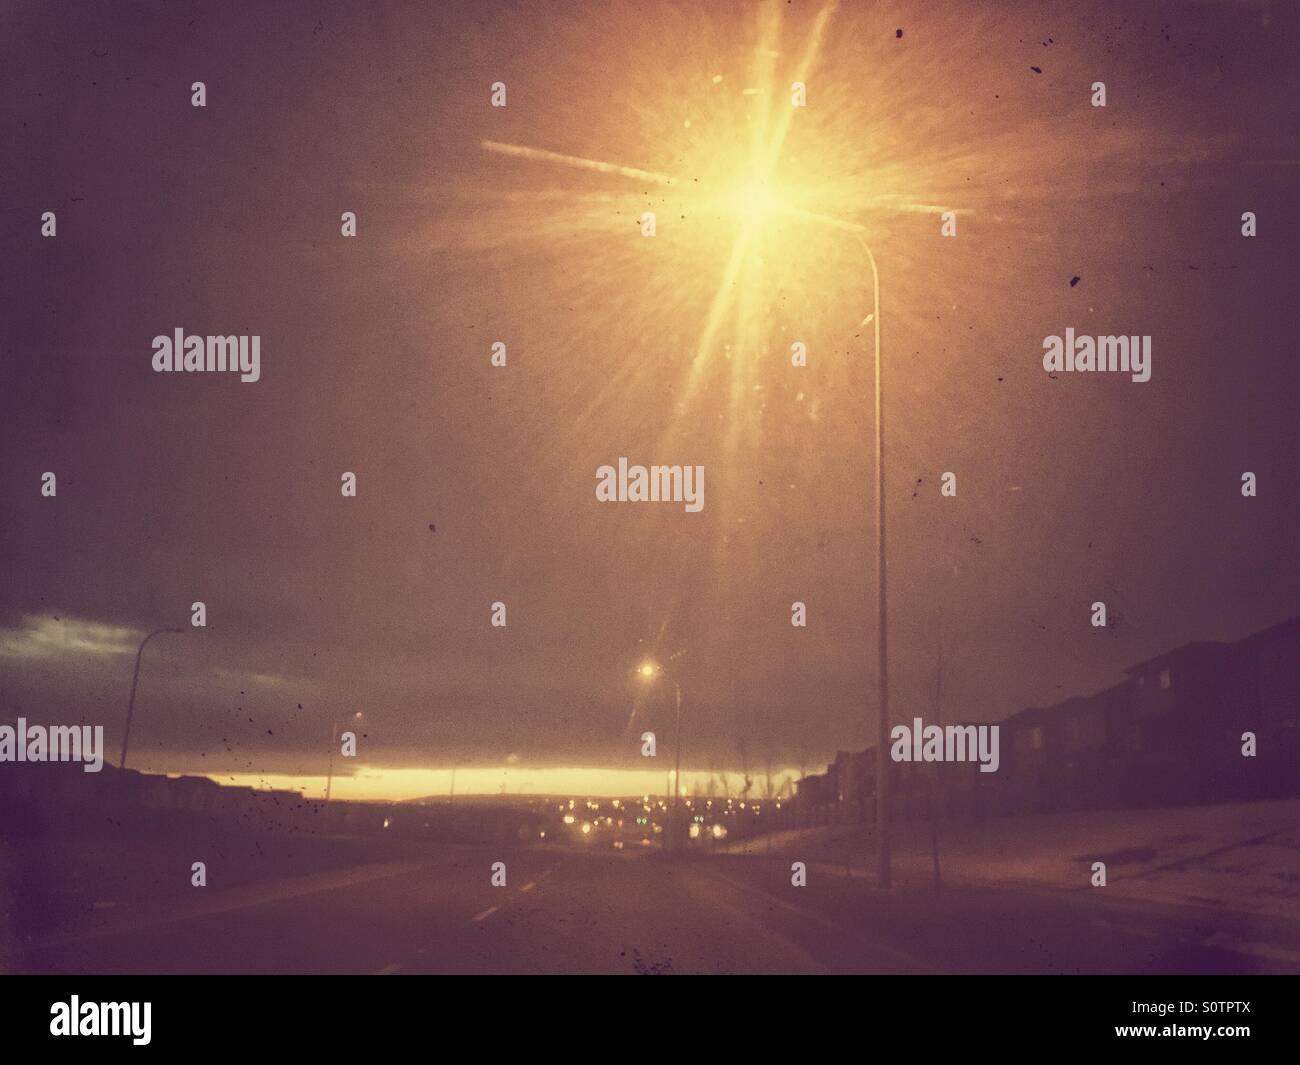 Those mornings - Stock Image